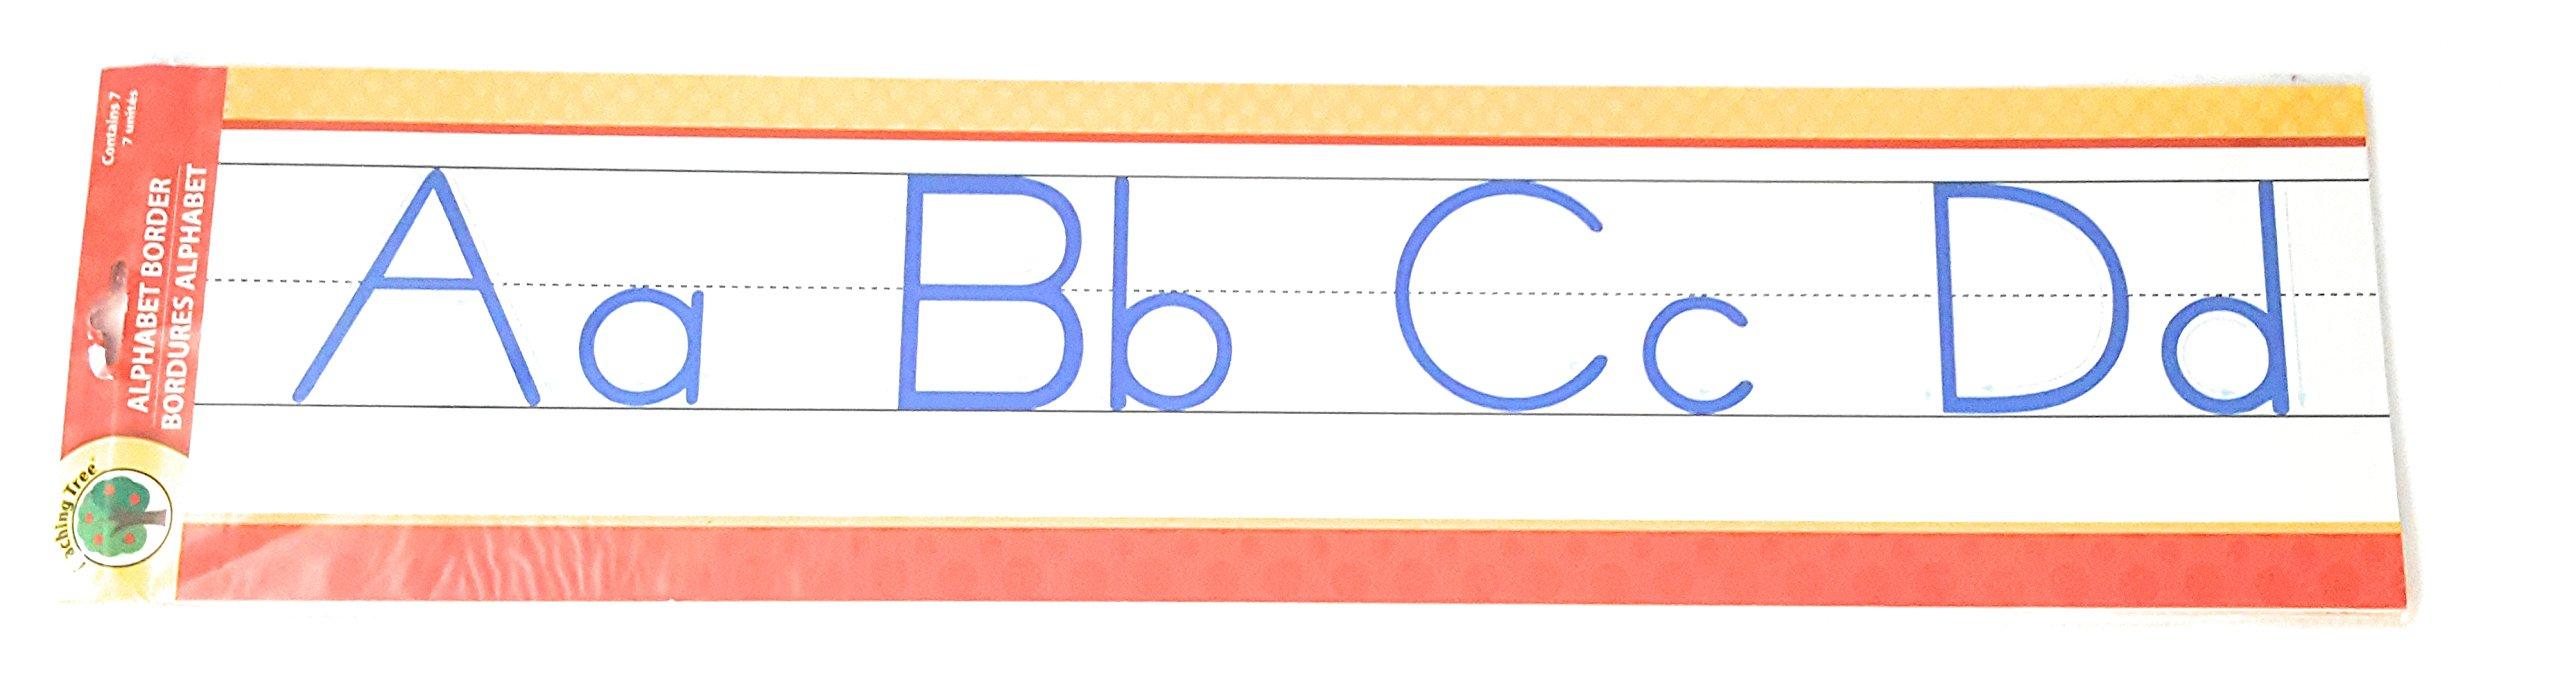 Teaching Tree Manuscript Alphabet Bulletin Back to School Board Creative Strips School Office Resources Scholastic Teacher Teacher's Bulletin Trim Wall Border Decal Classroom Decoration Red/Yellow Dot